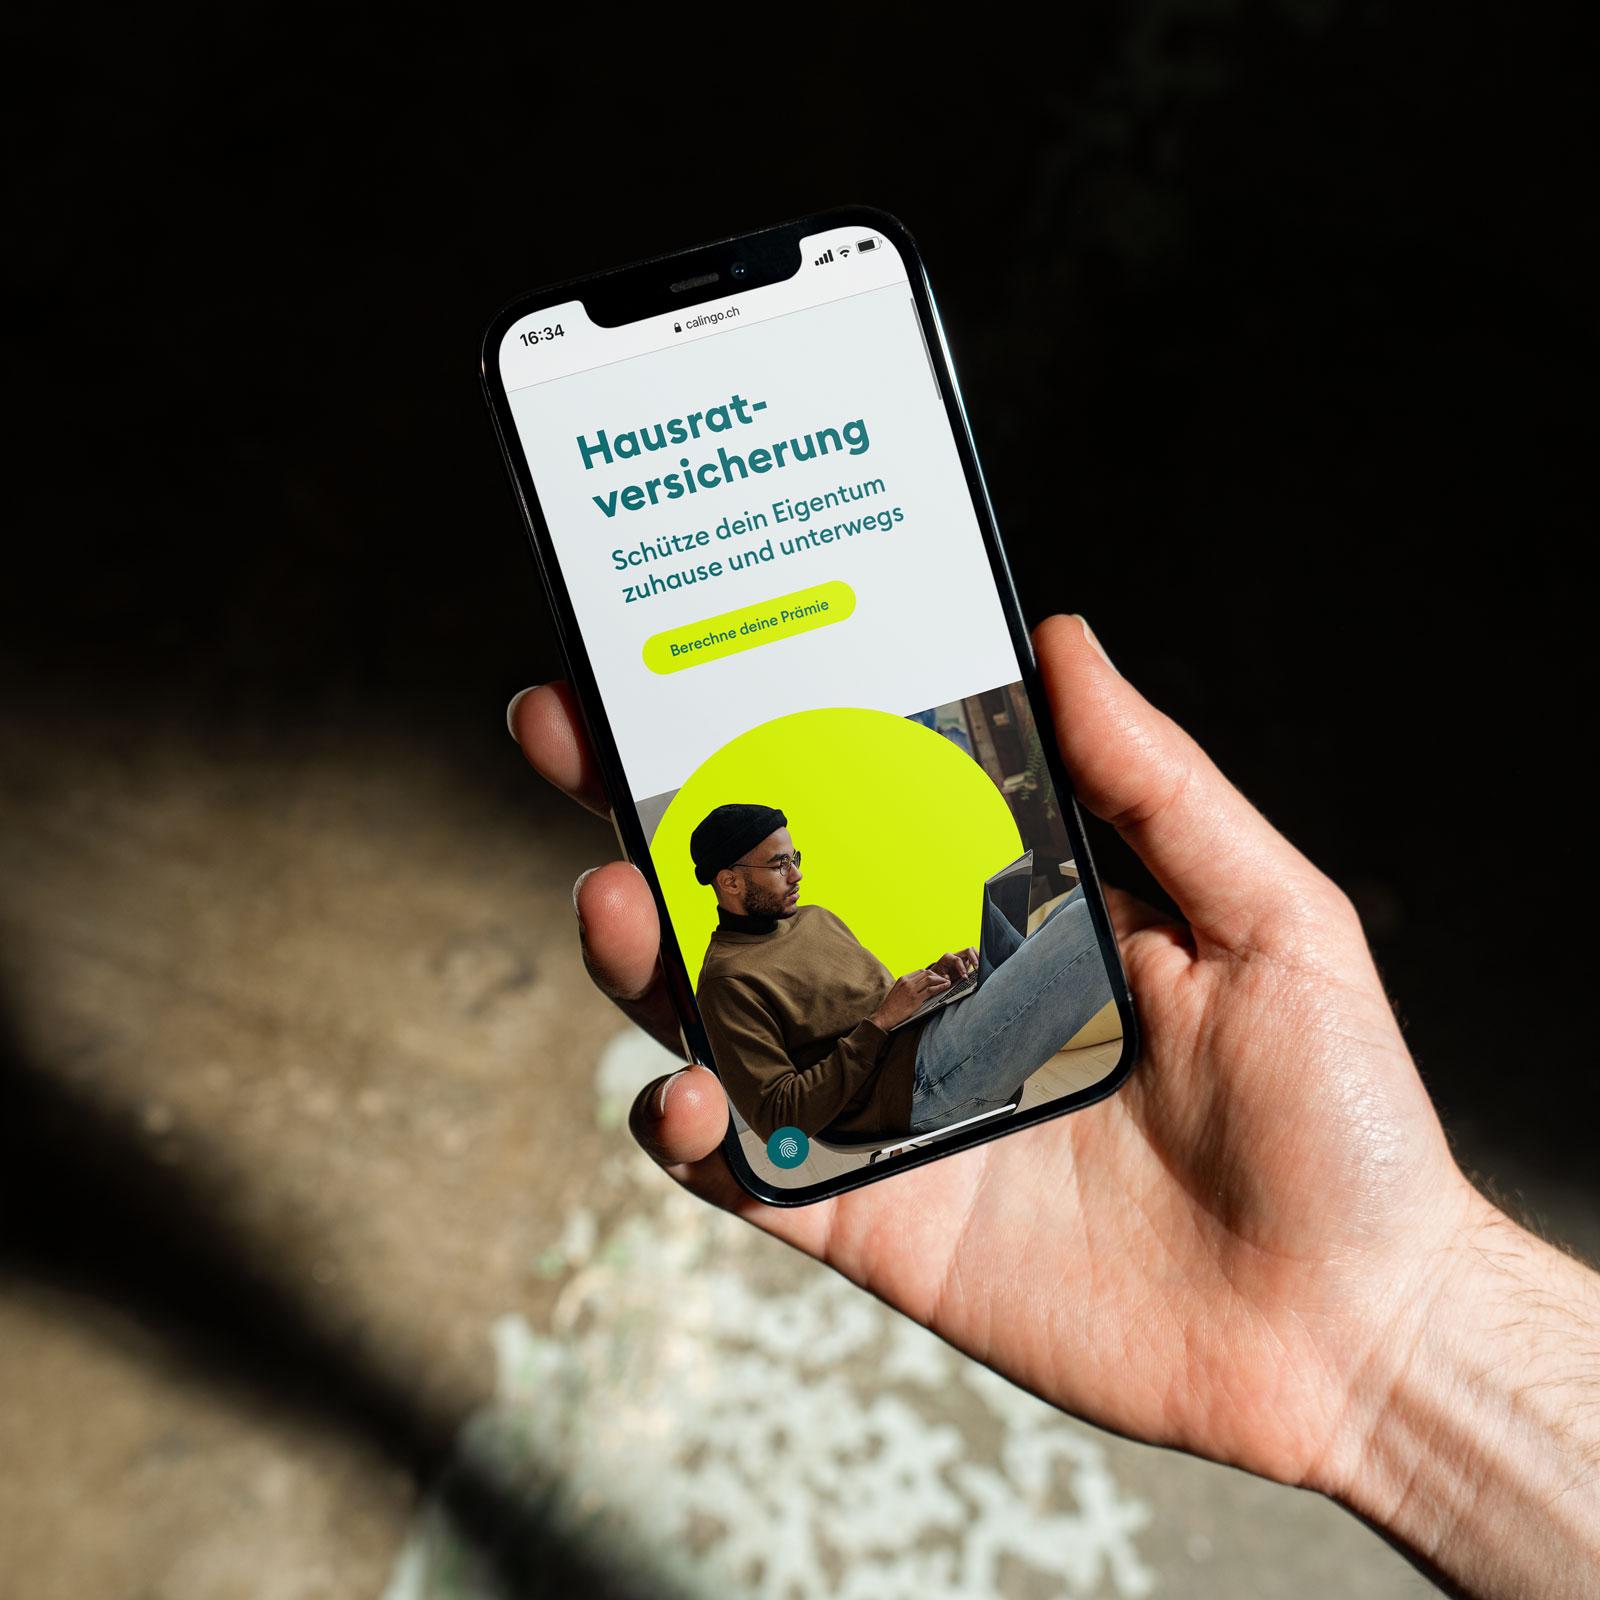 Calingo Webseite auf dem Smartphone